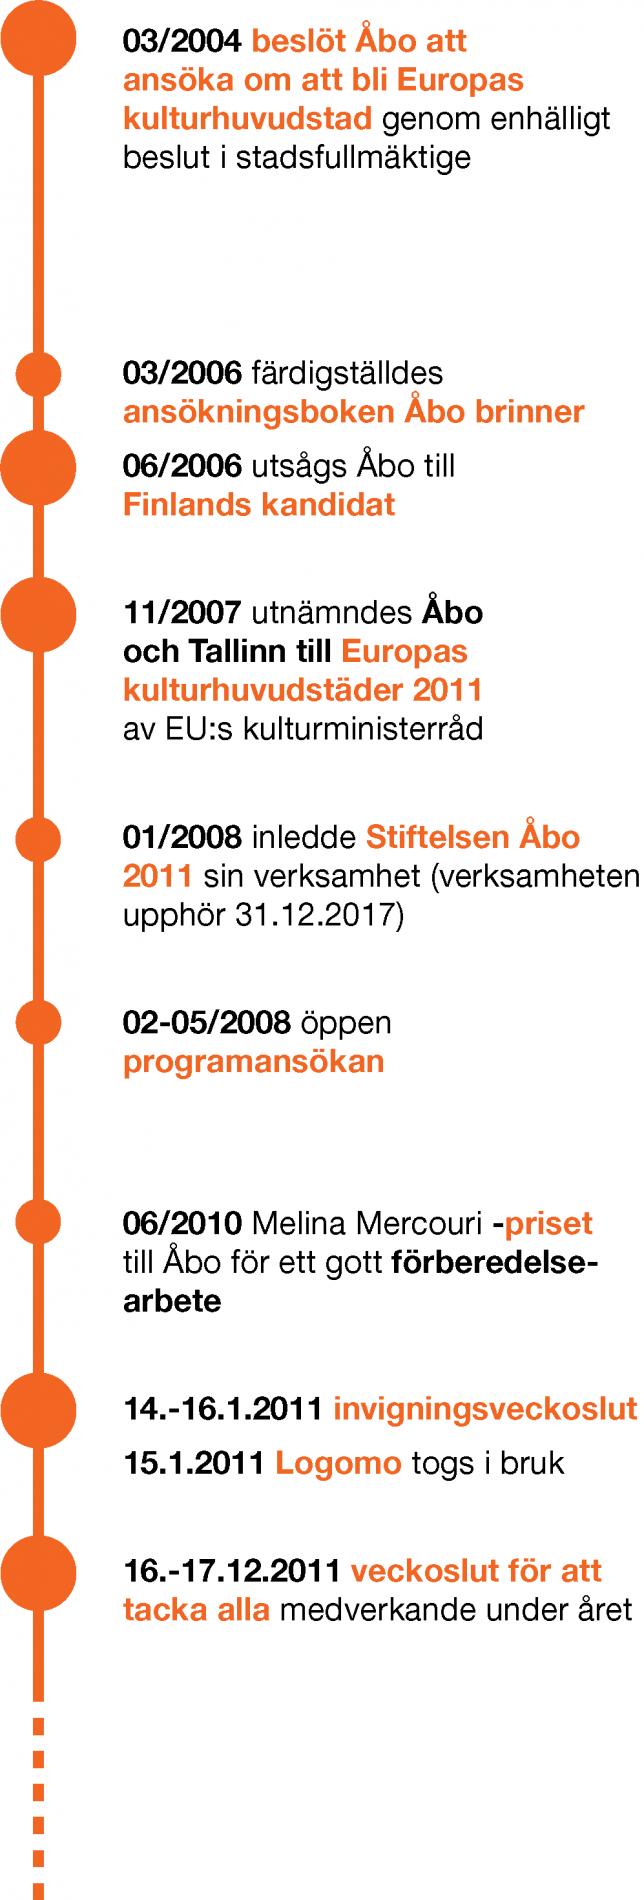 Åbo 2011 -fakta